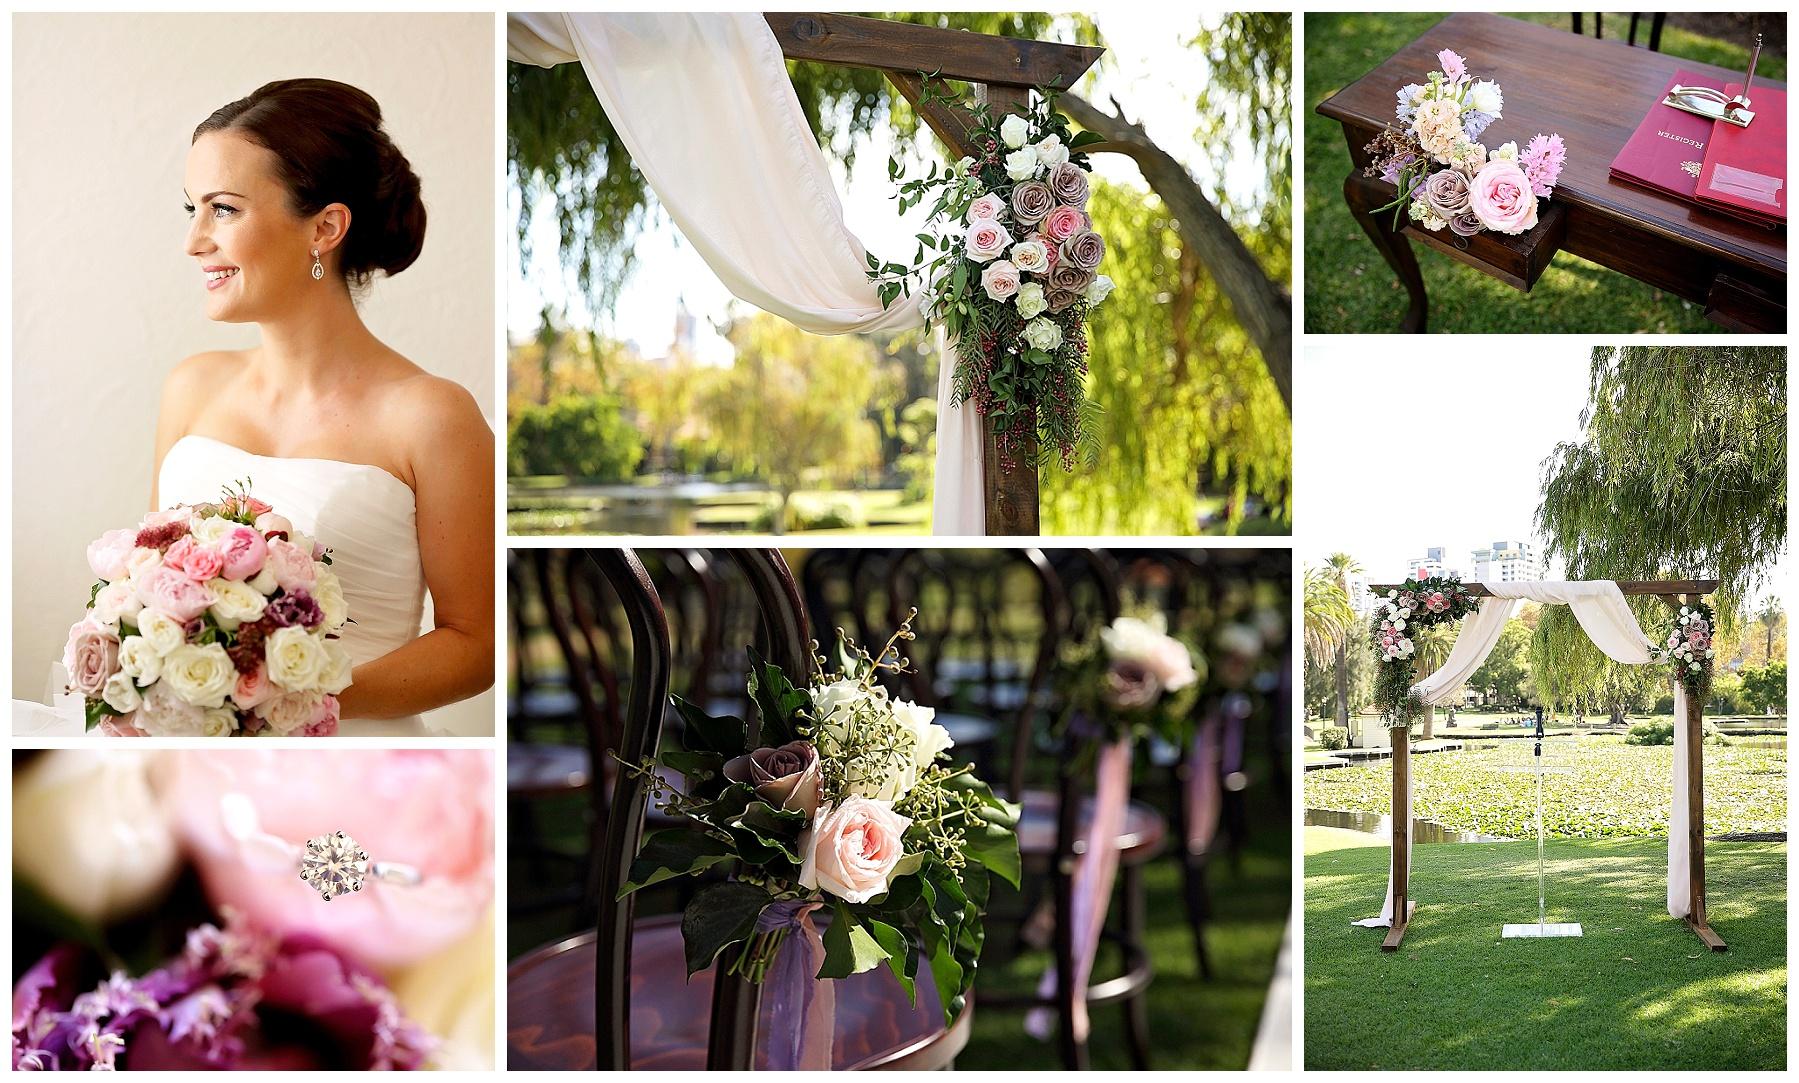 Wedding with Flair ceremony